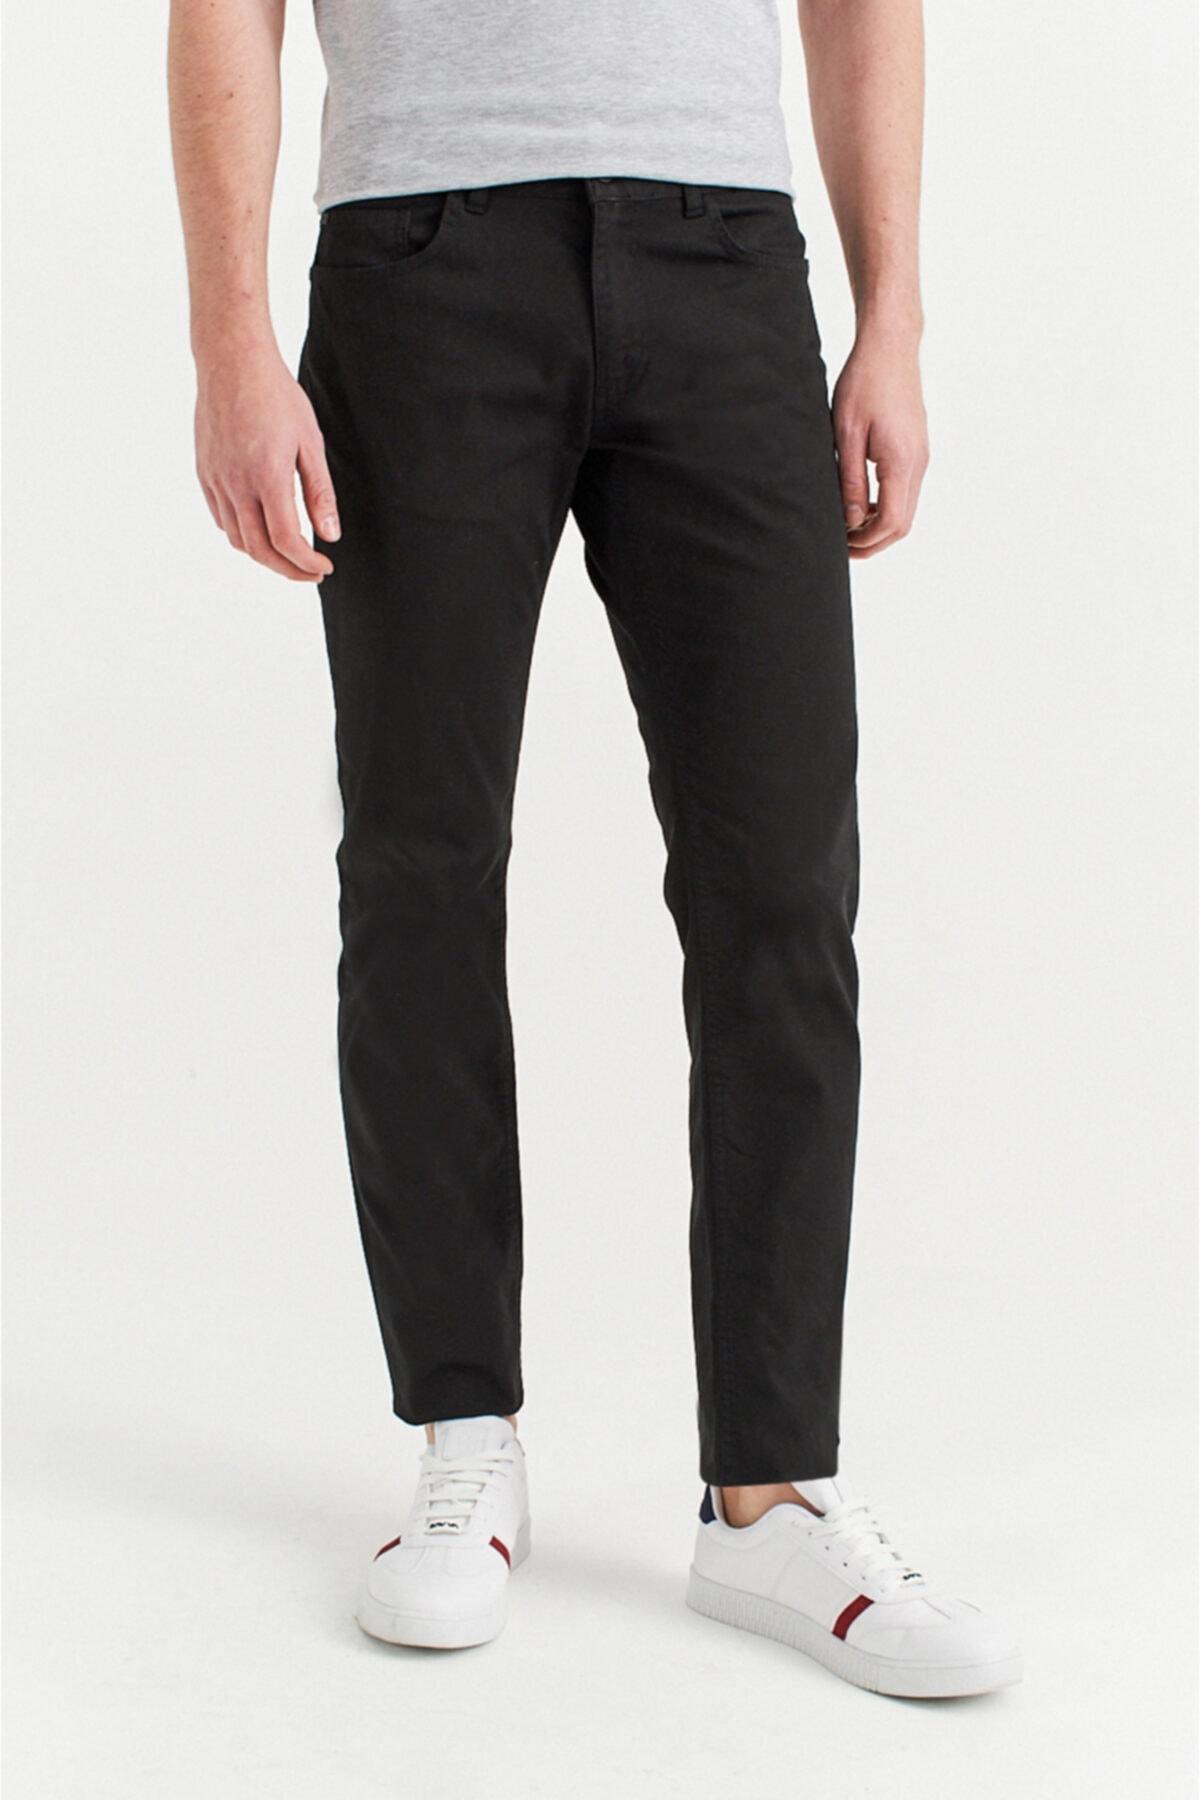 Avva Erkek Siyah 5 Cepli Armürlü Slim Fit Pantolon A92y3086 2